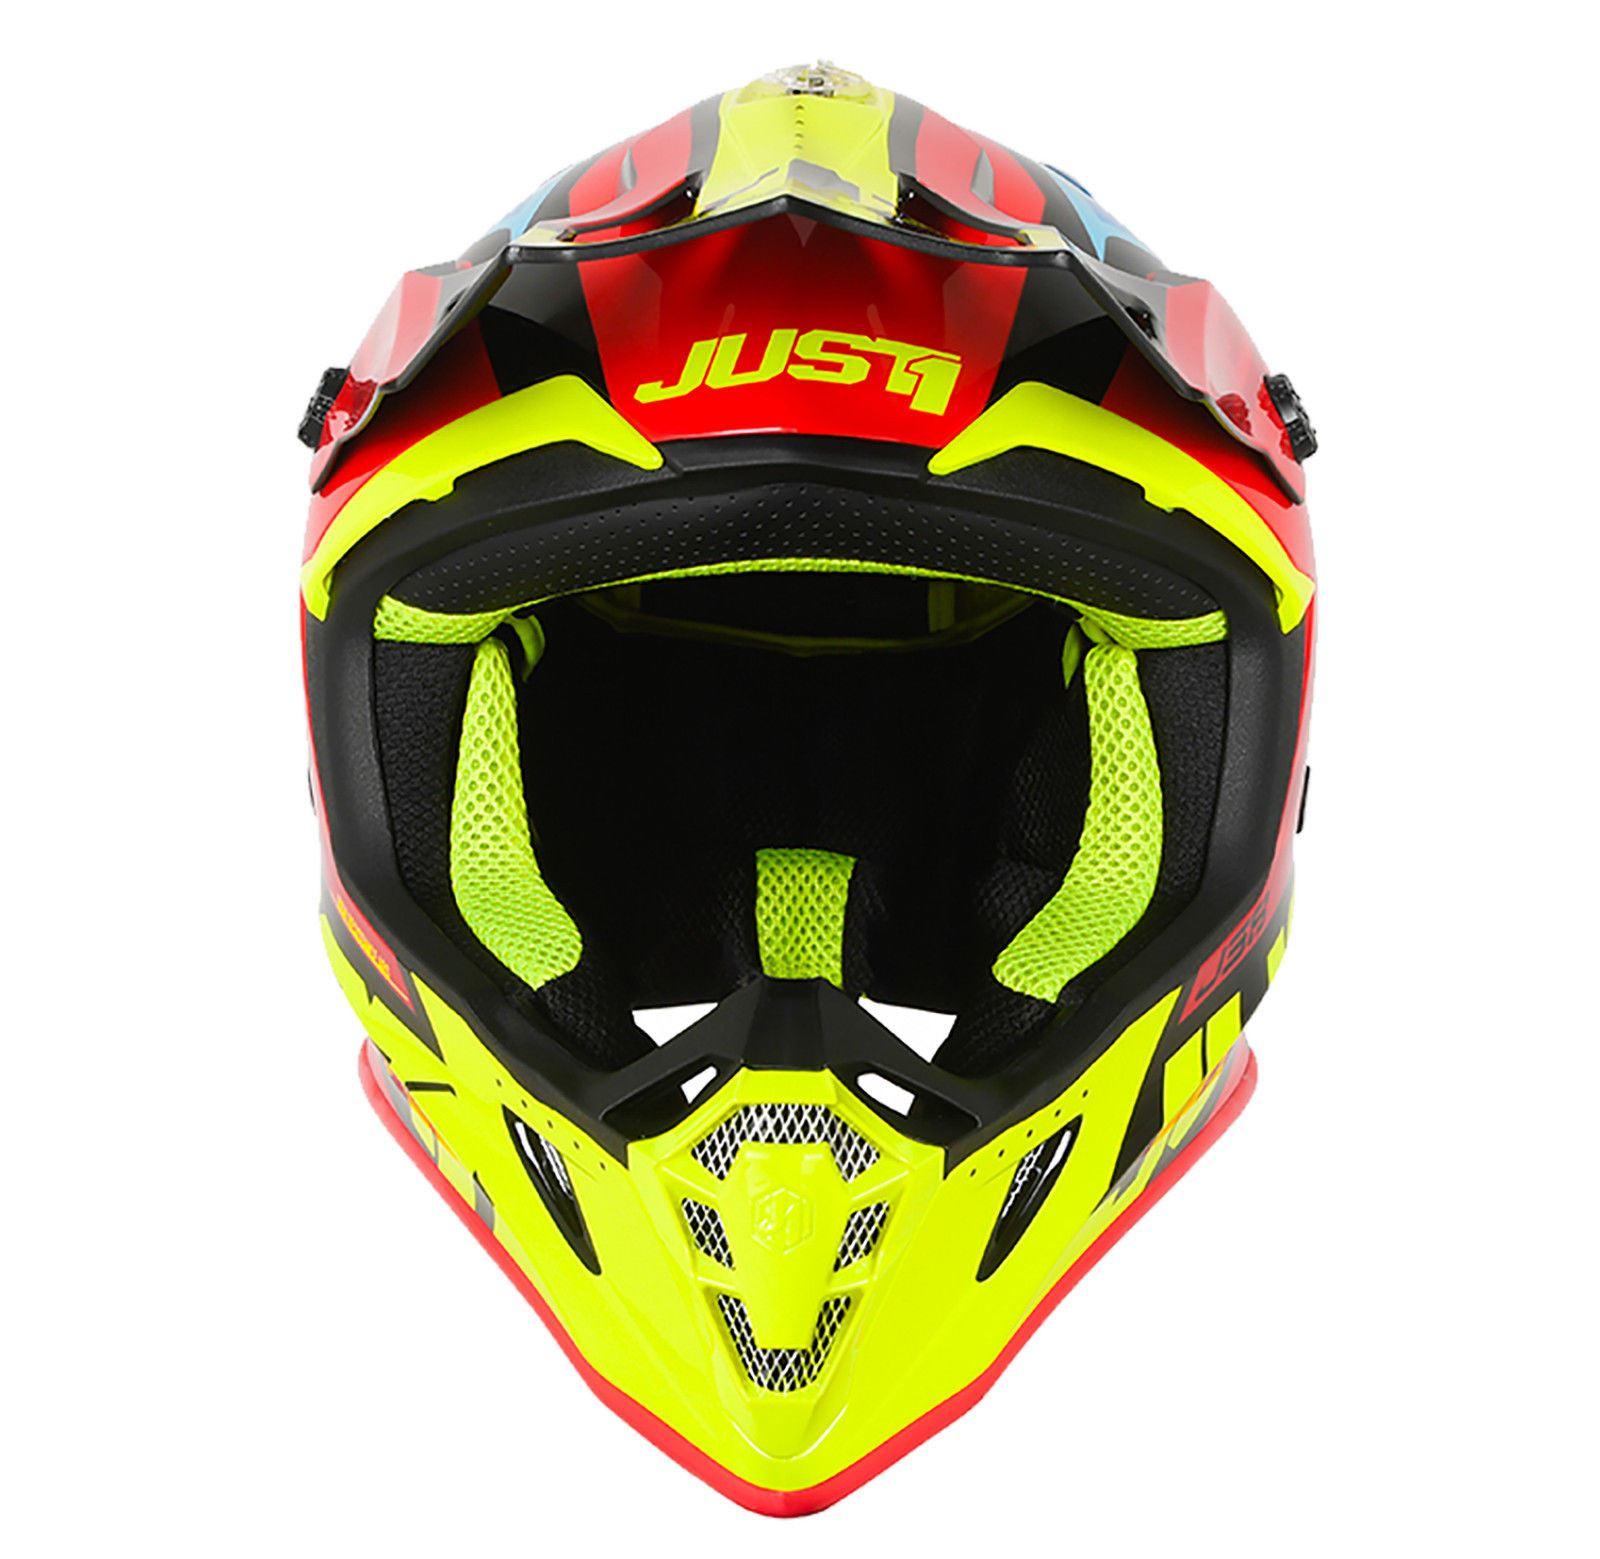 Just1-J38-Blade-Helmet-Motocross-Enduro-MX-ATV-Motorcycle-Off-Road-Full-Face-ACU thumbnail 15